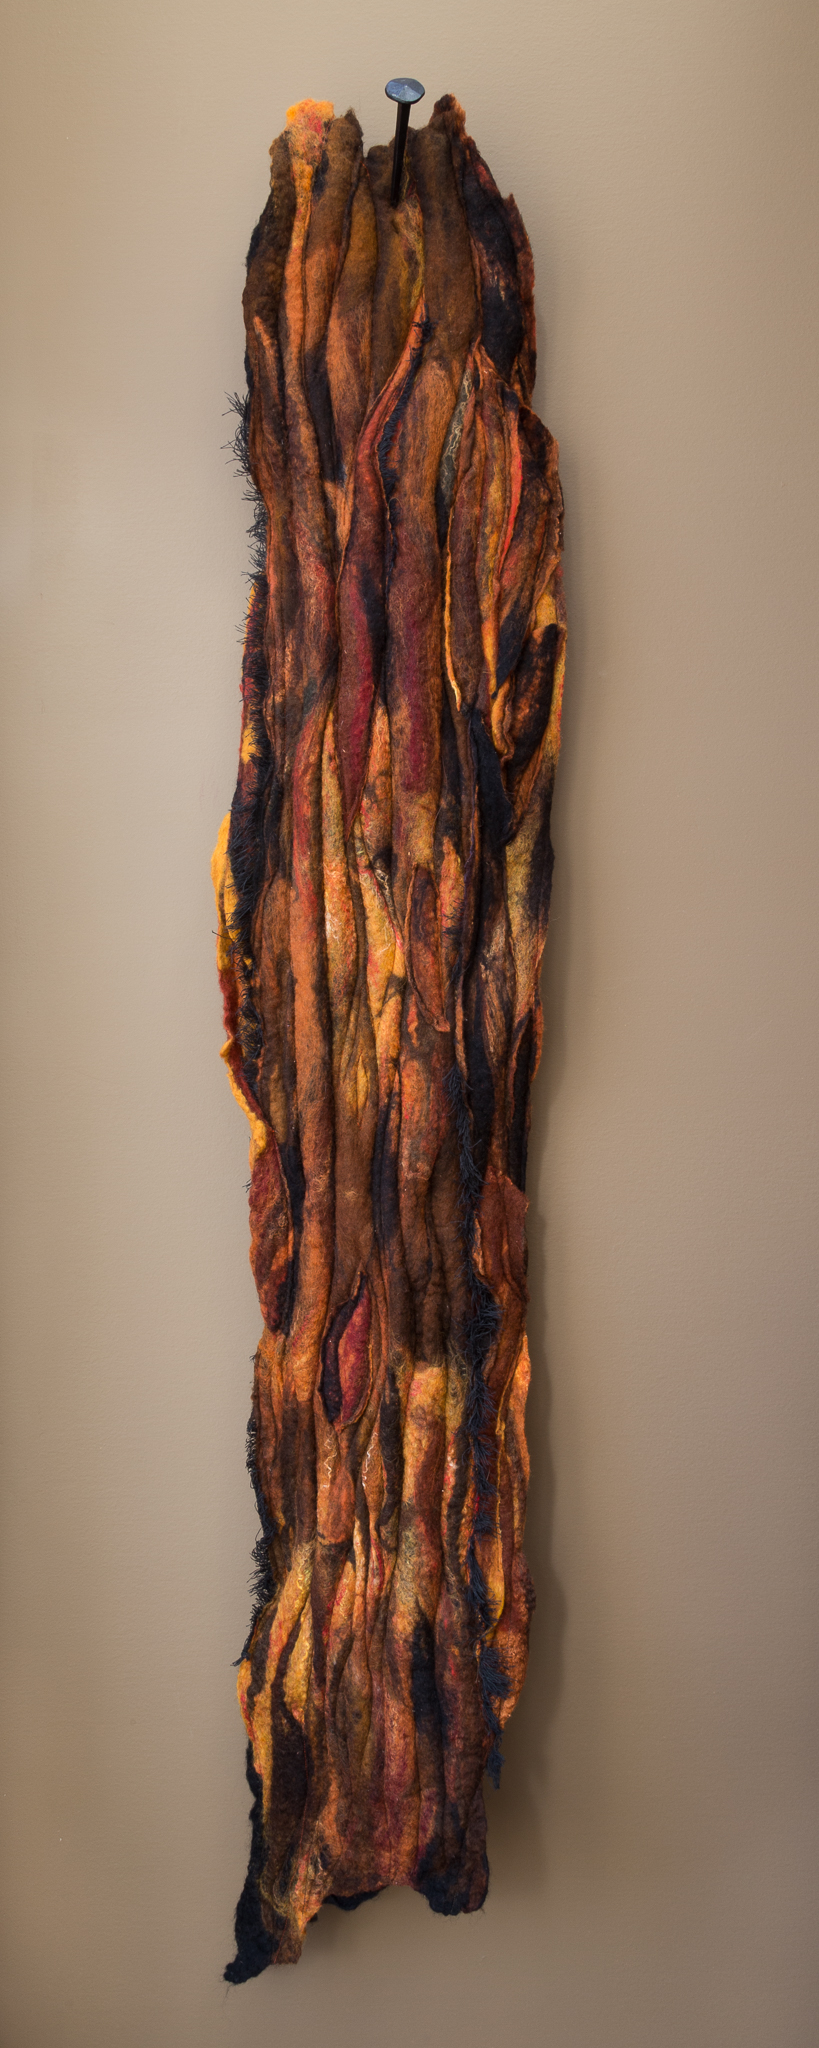 Tree Skin- burnt.jpg